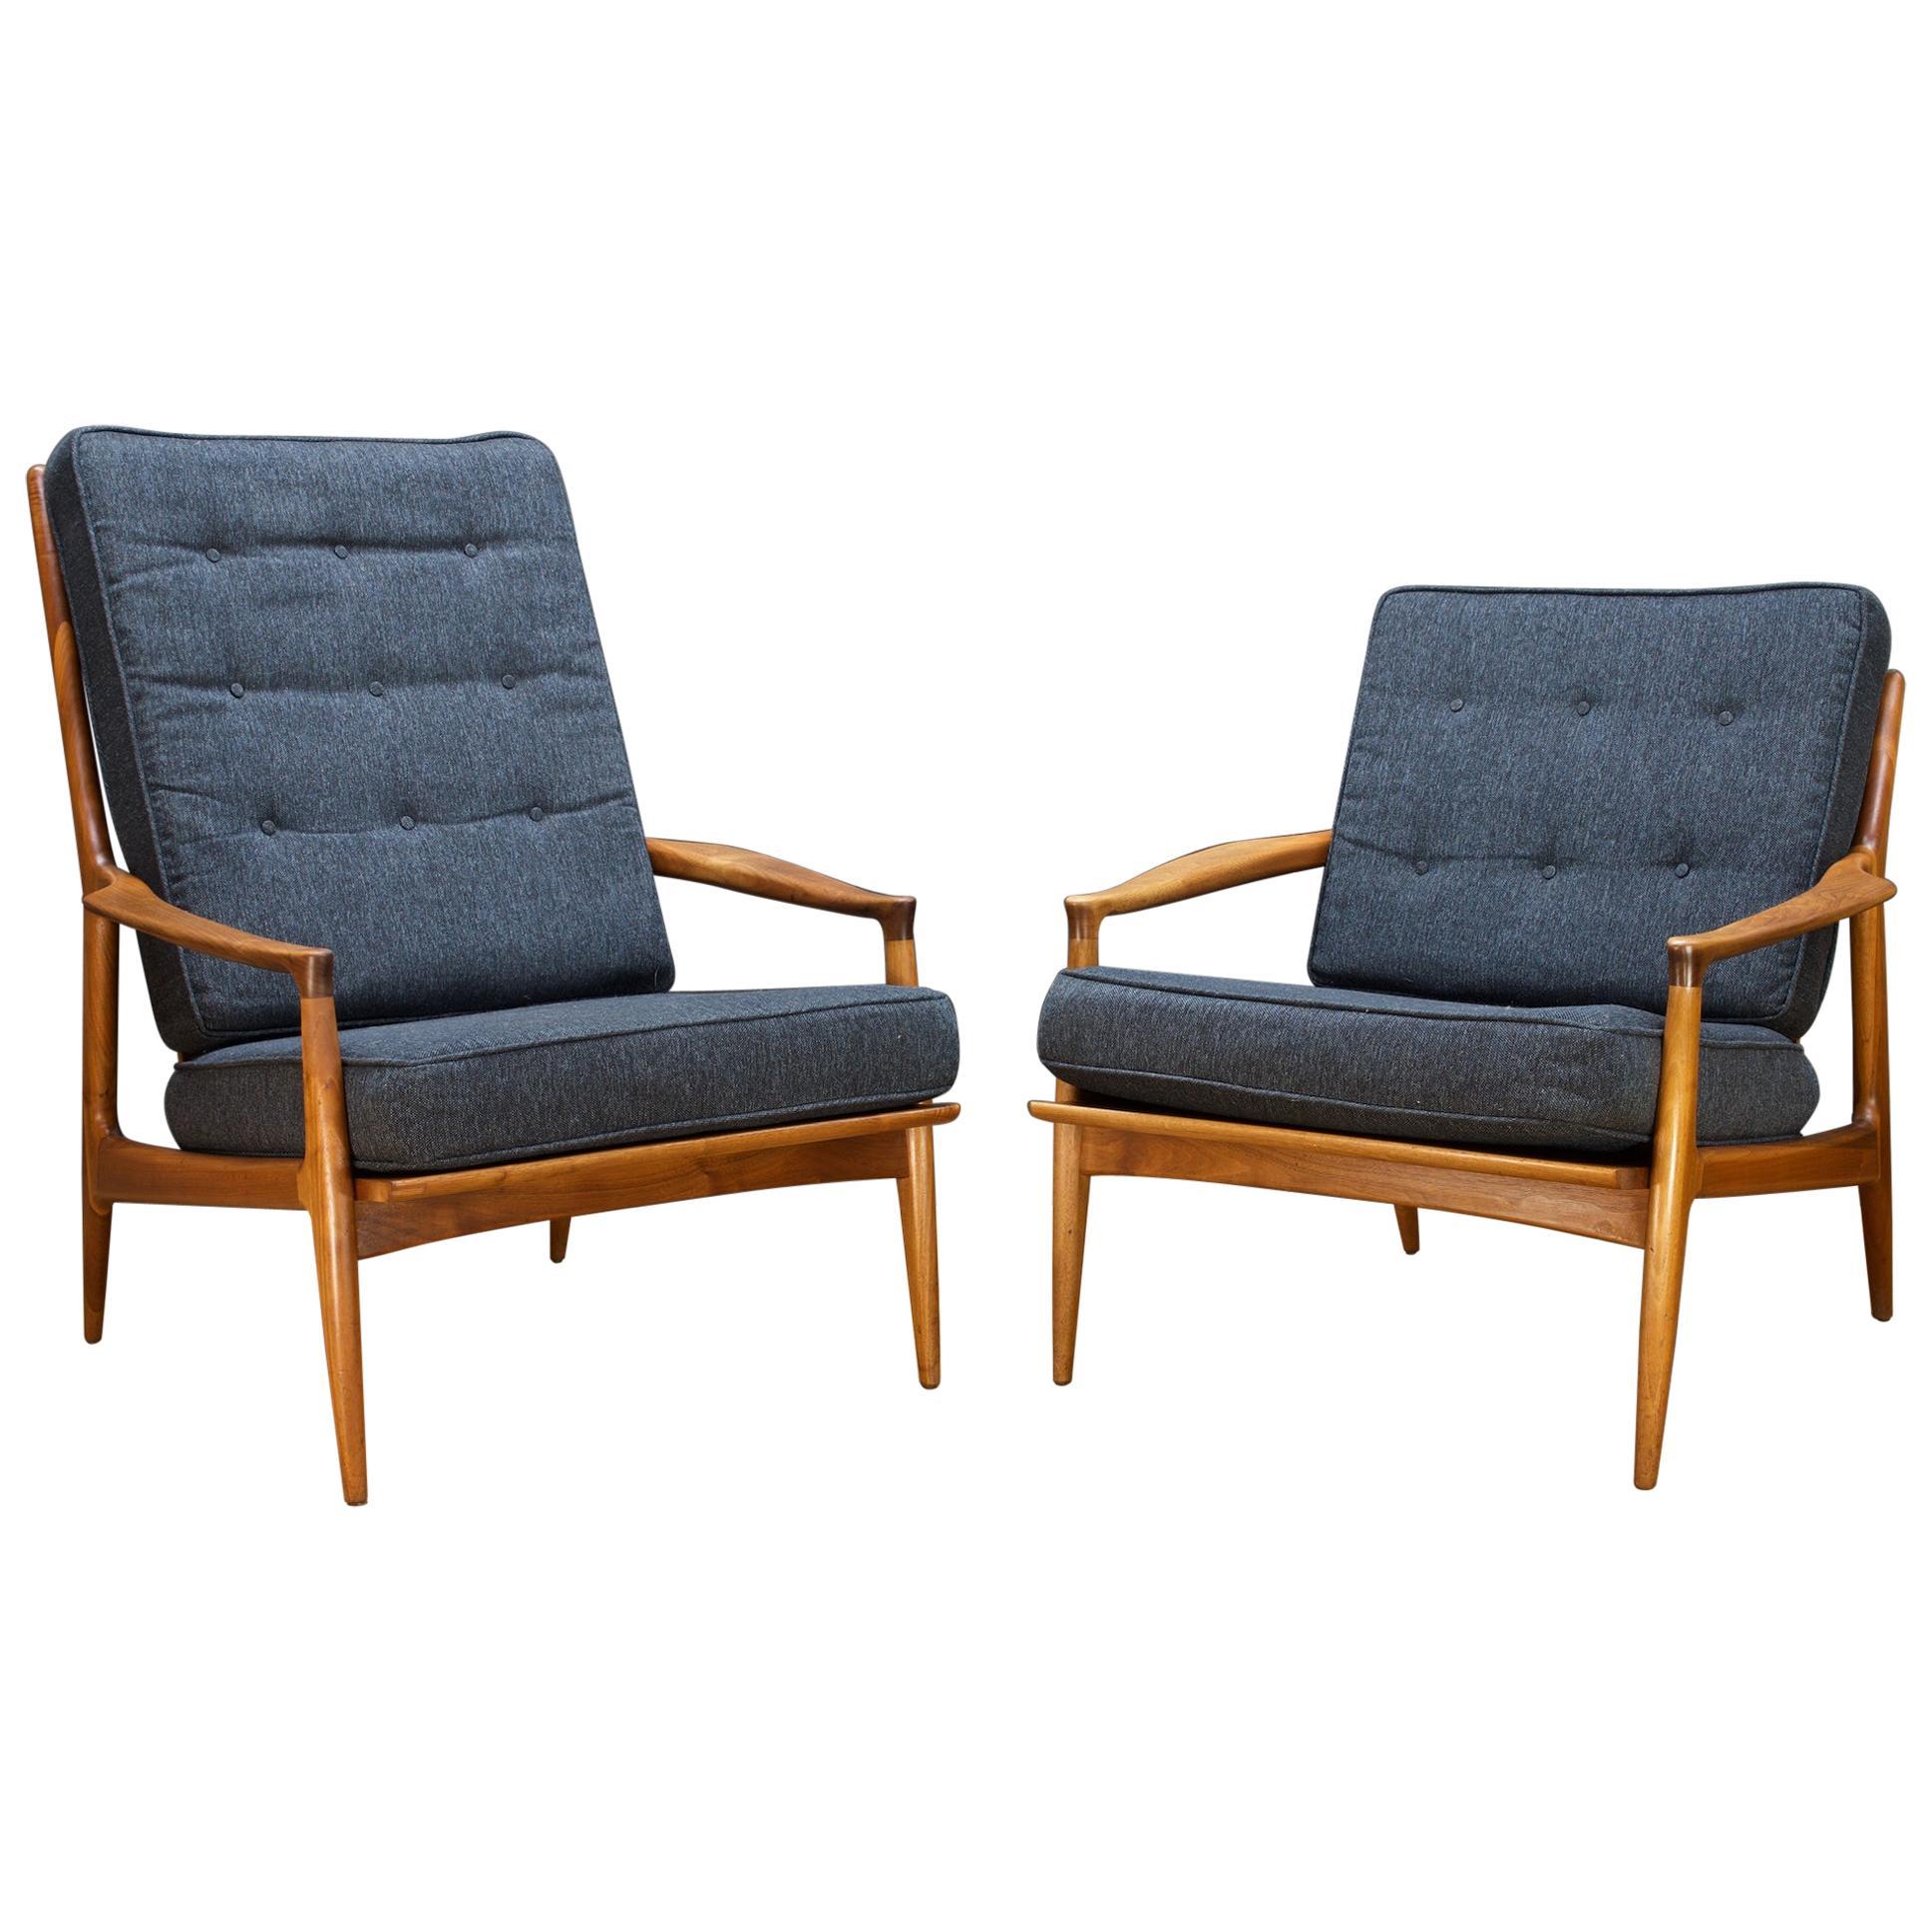 Genial Milo Baughman Furniture: Chairs, Recliners U0026 More   1,084 ...